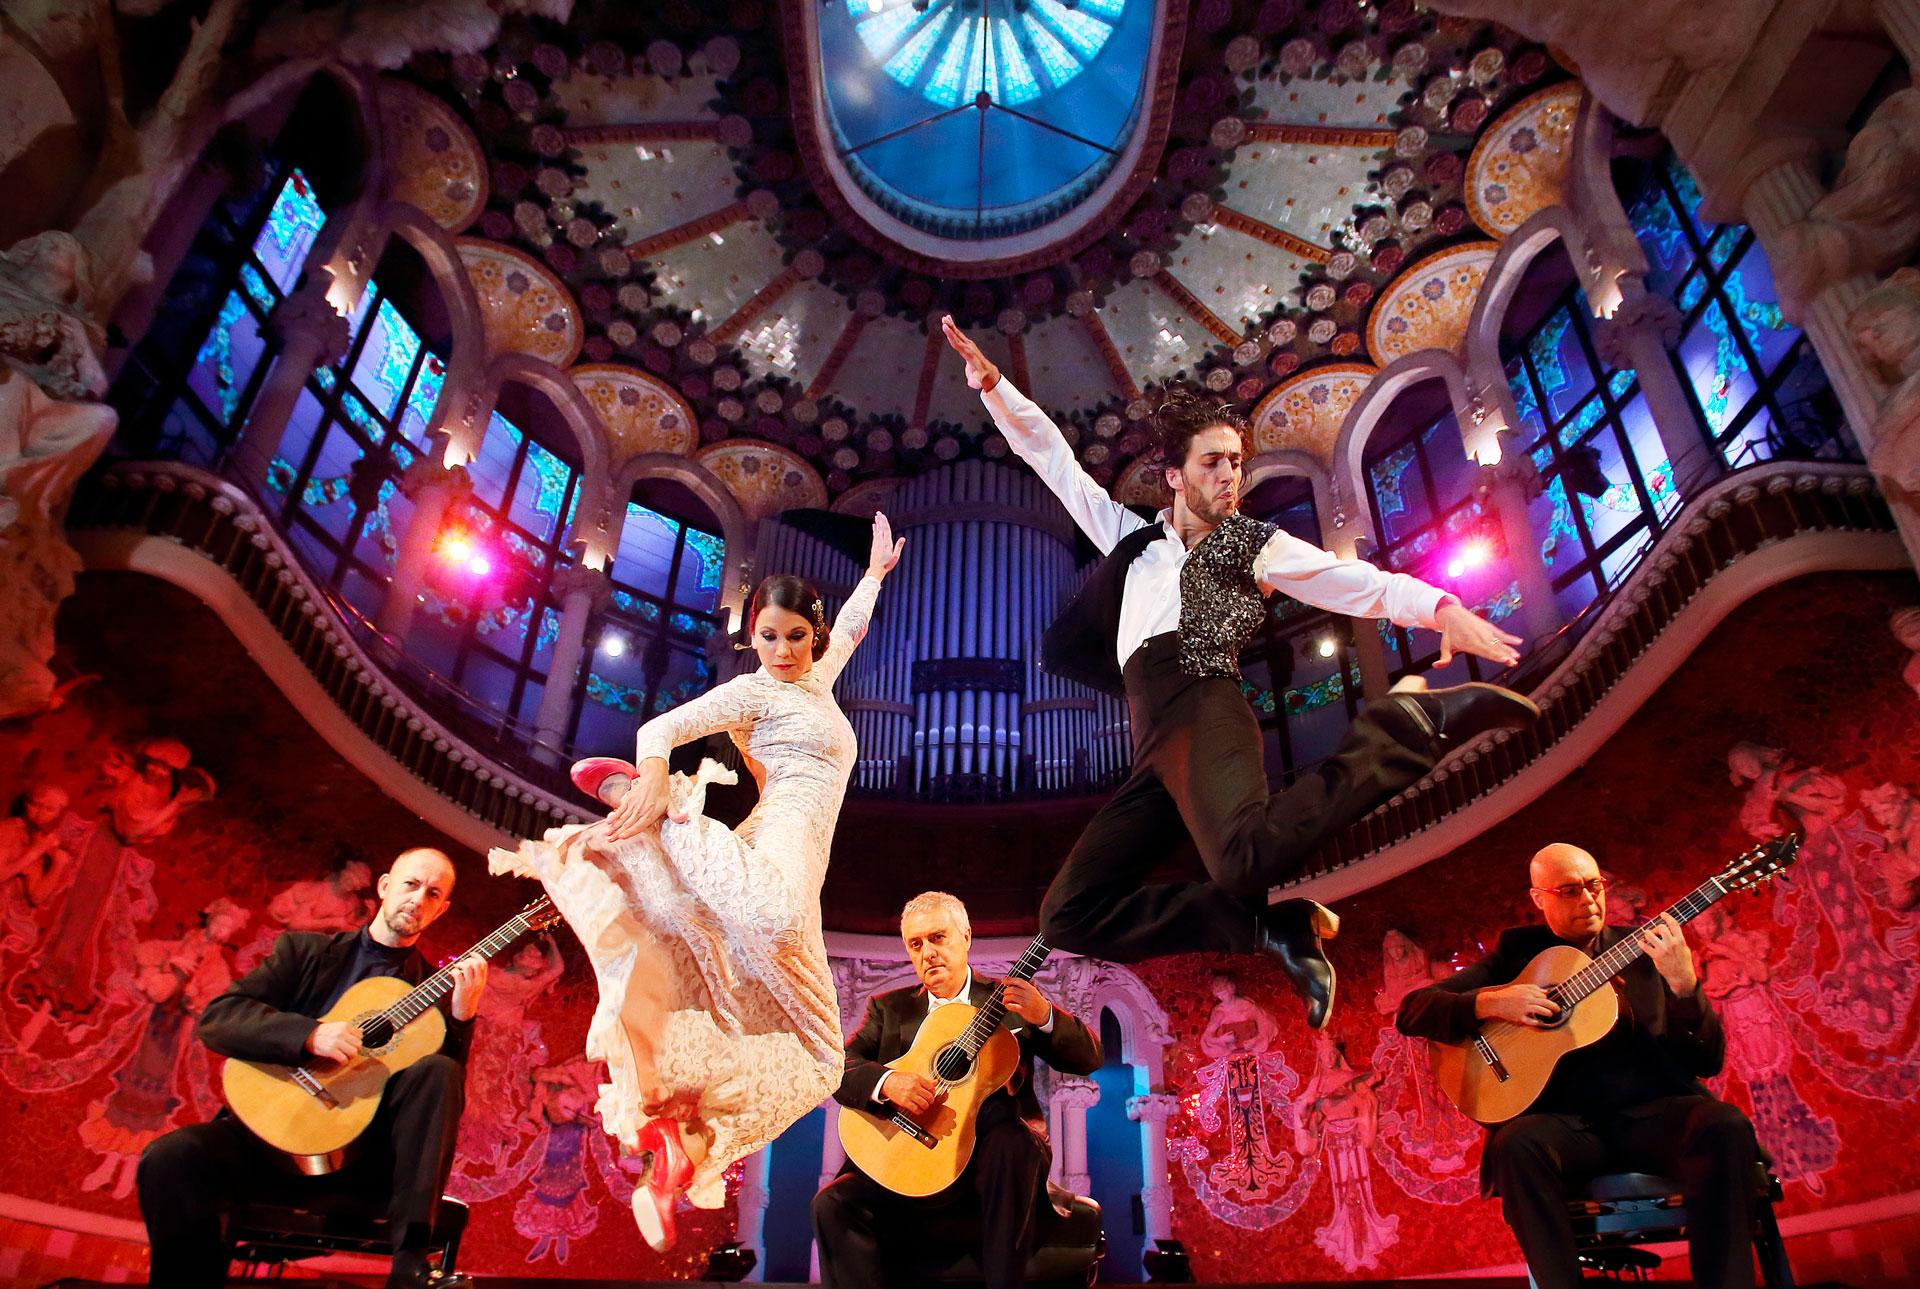 Barcelona Guitar Trio al Palau de la Música Catalana